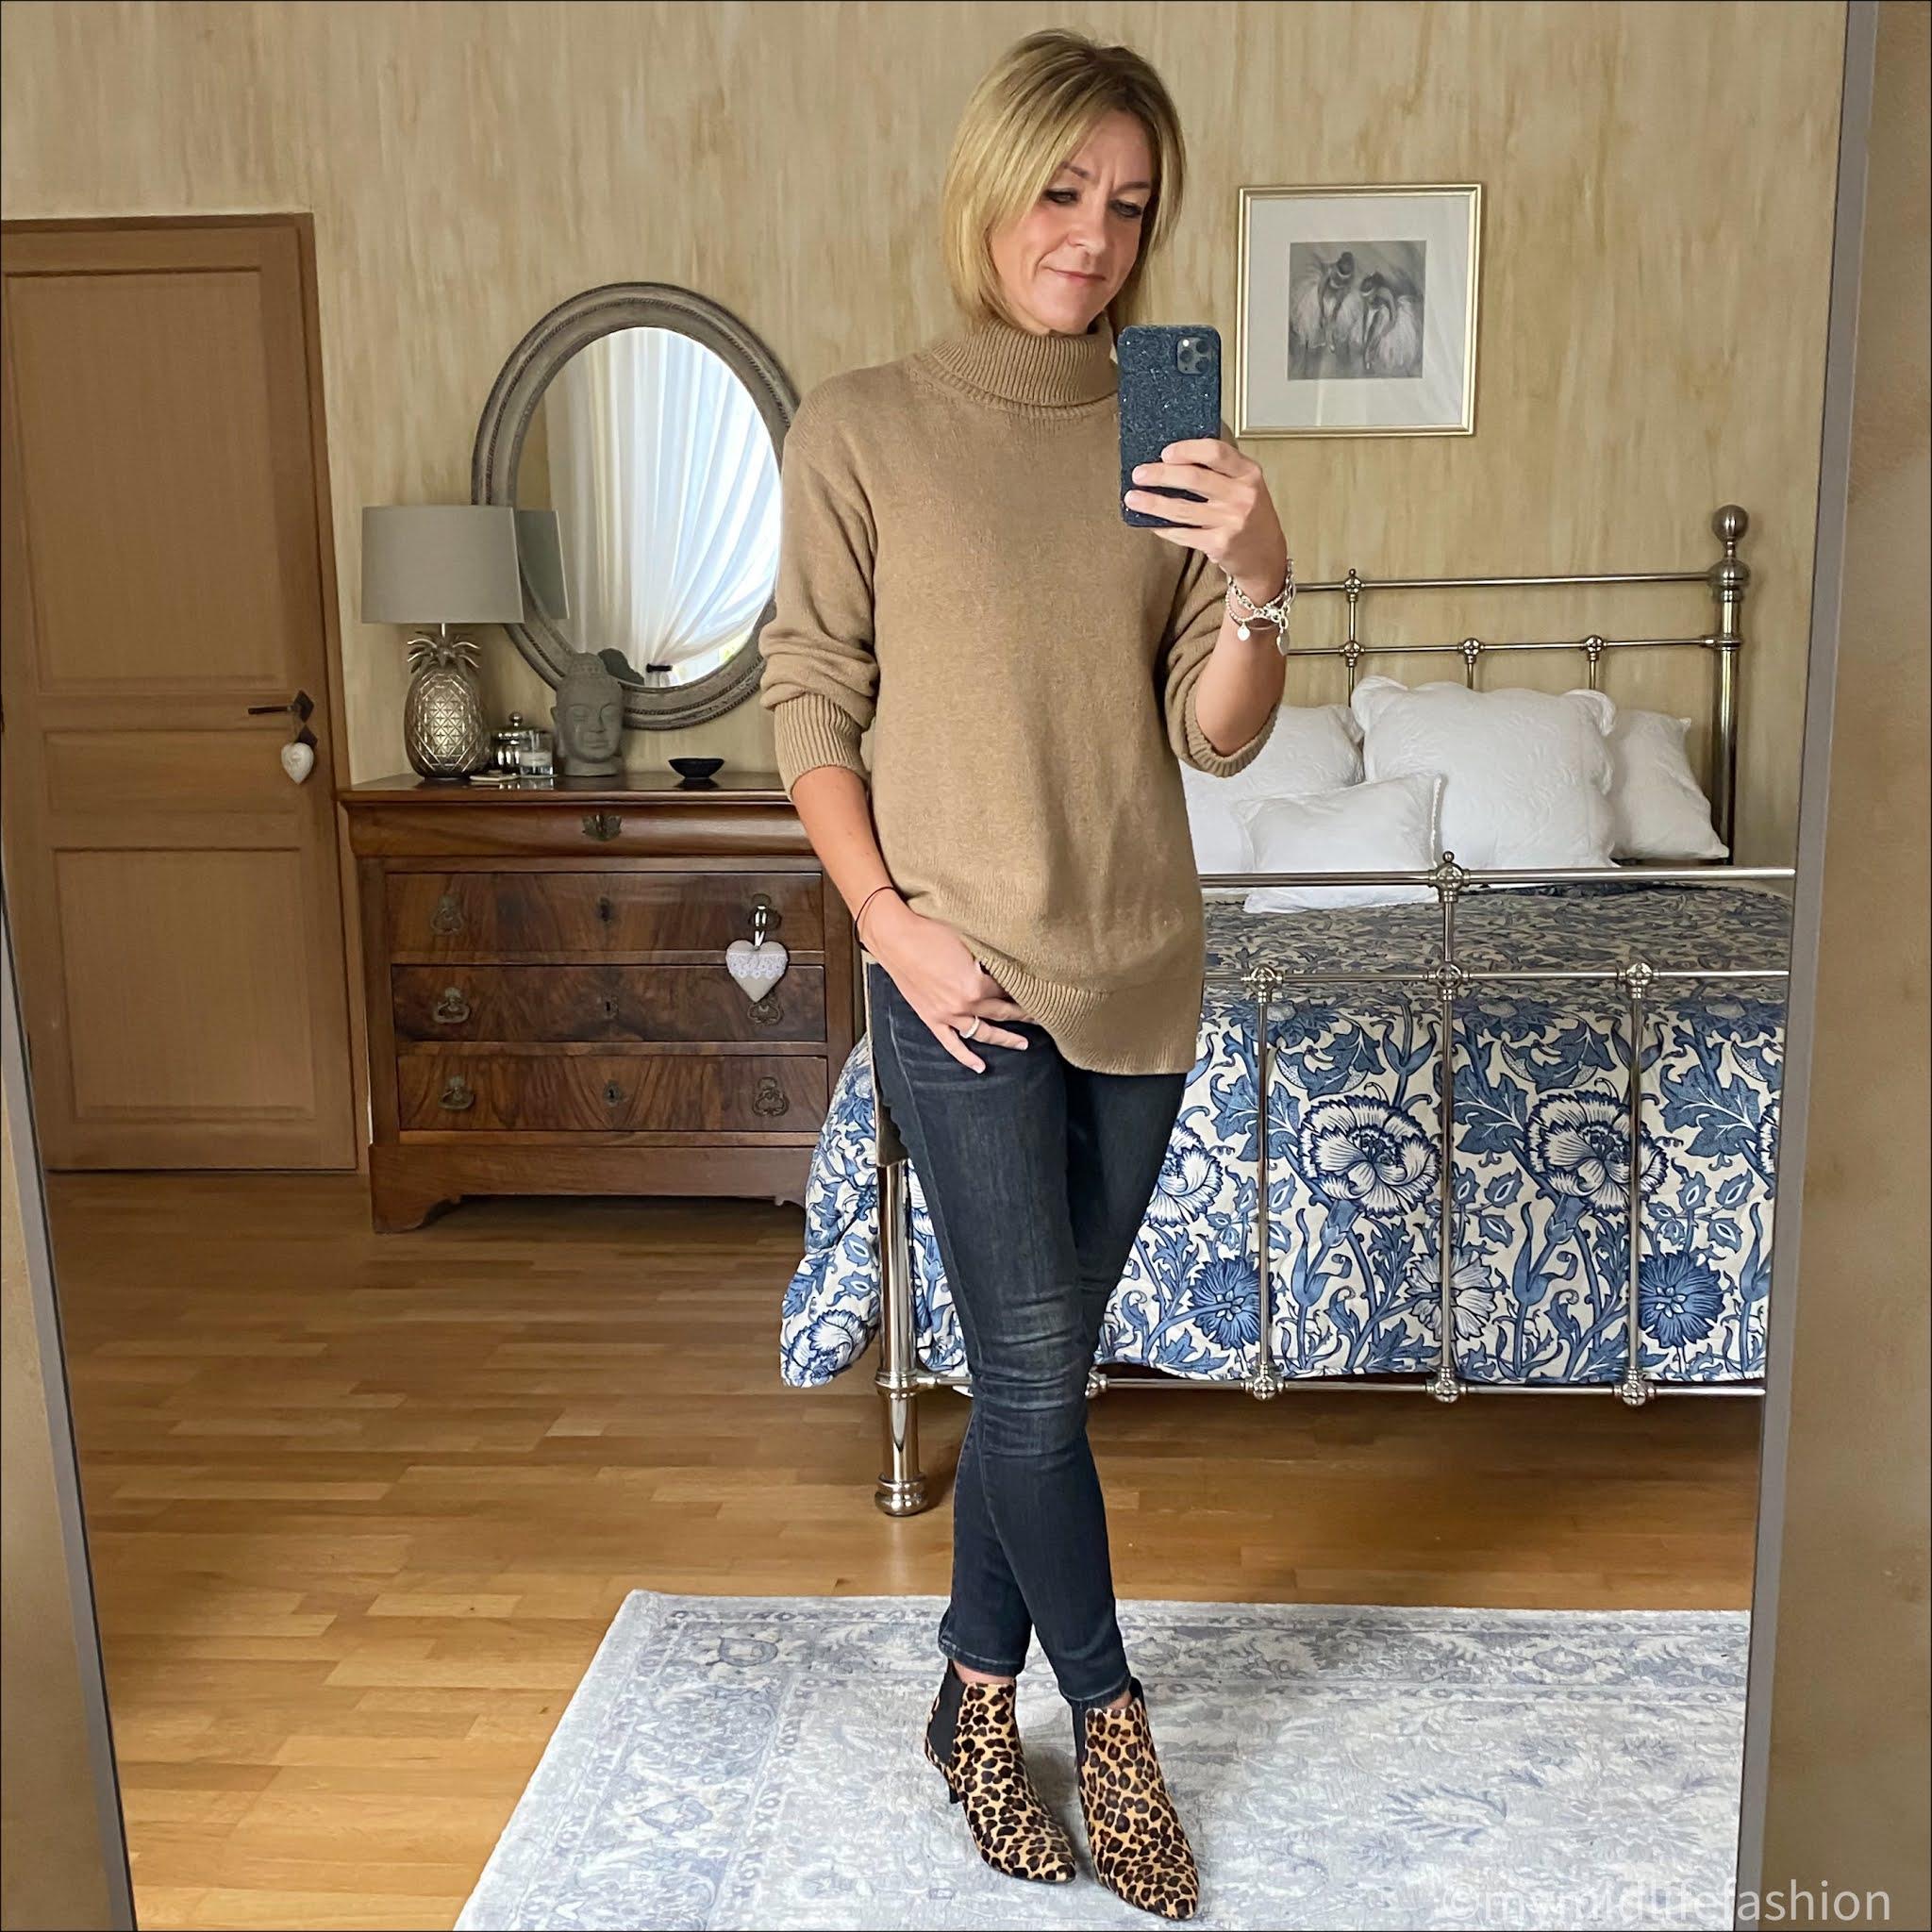 my midlife fashion, baukjen Tamara Jumper, j crew 9 inch toothpick skinny jeans, hush kitten heel leopard print boots